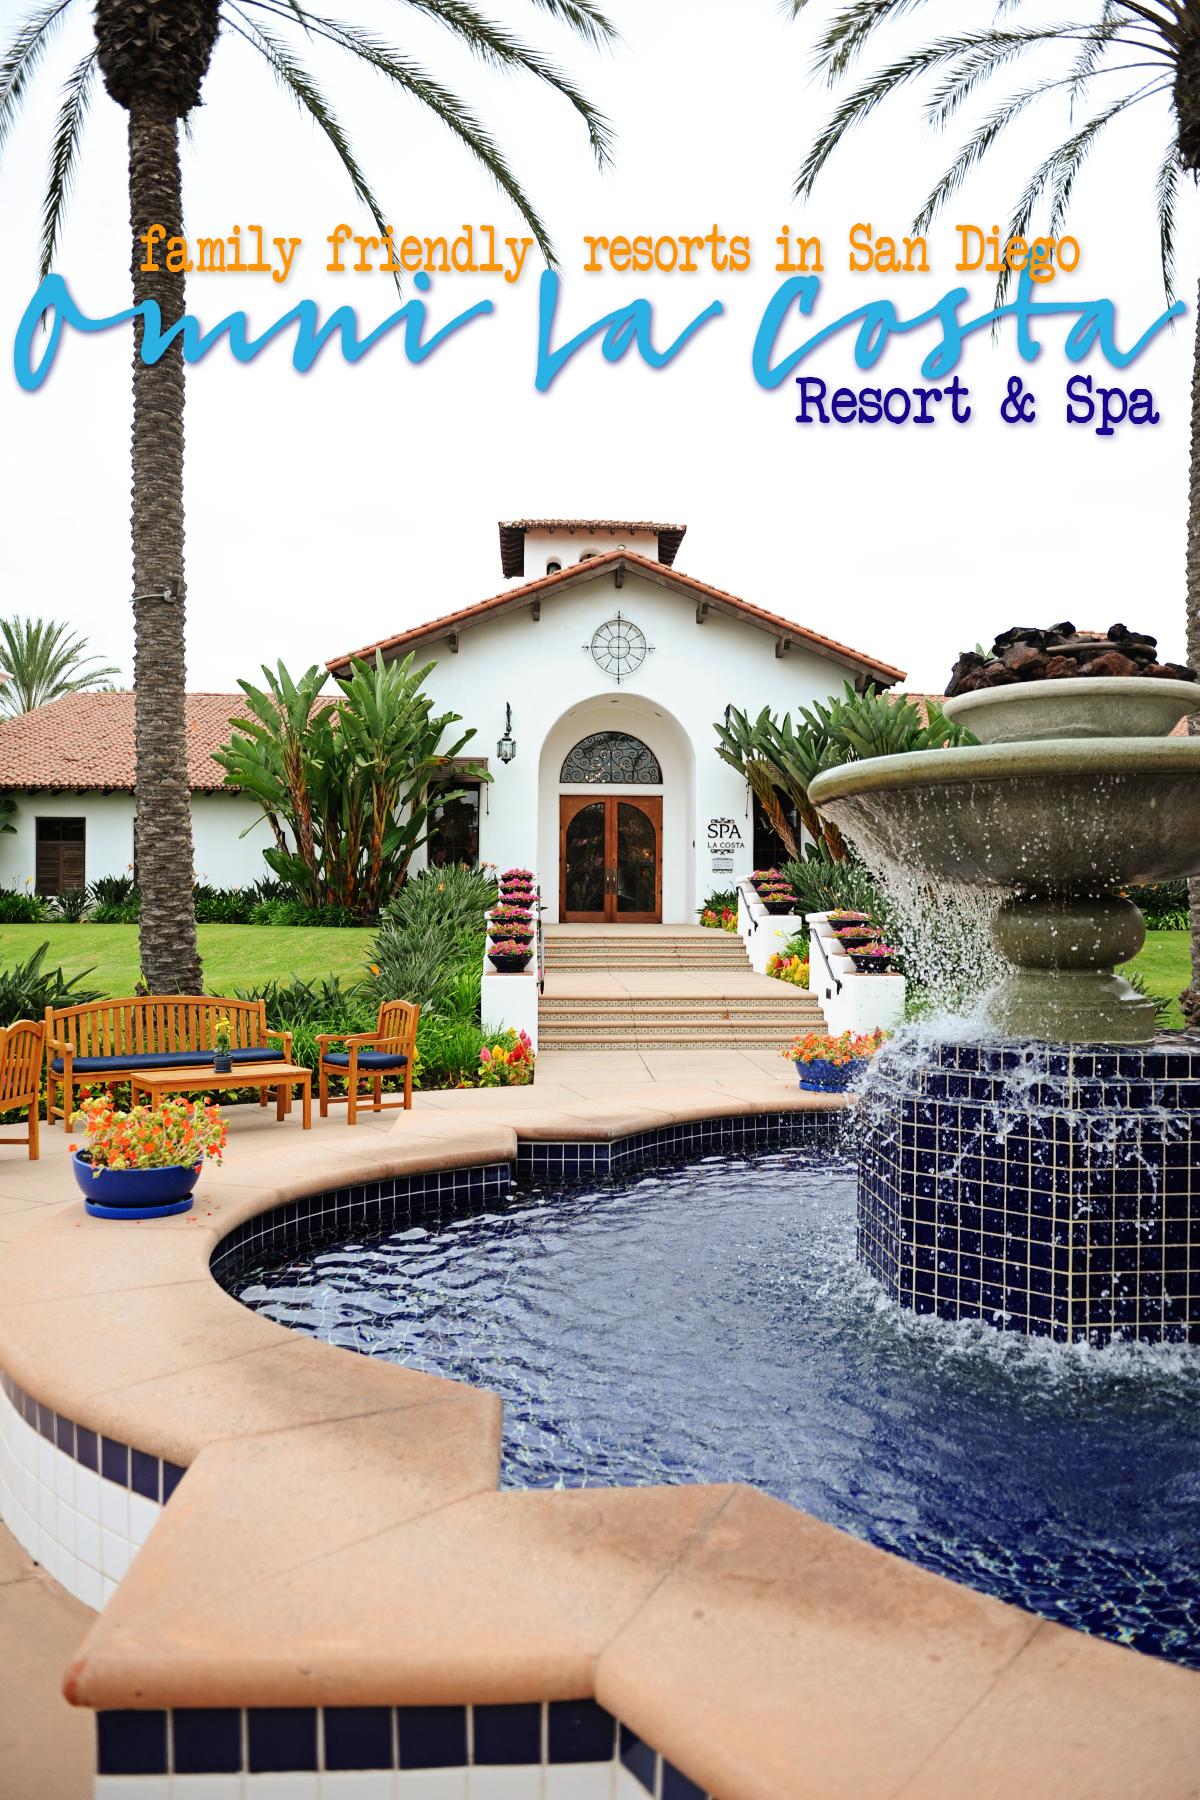 Family Friendly Resorts in San Diego : Omni La Costa Golf Resort & Spa